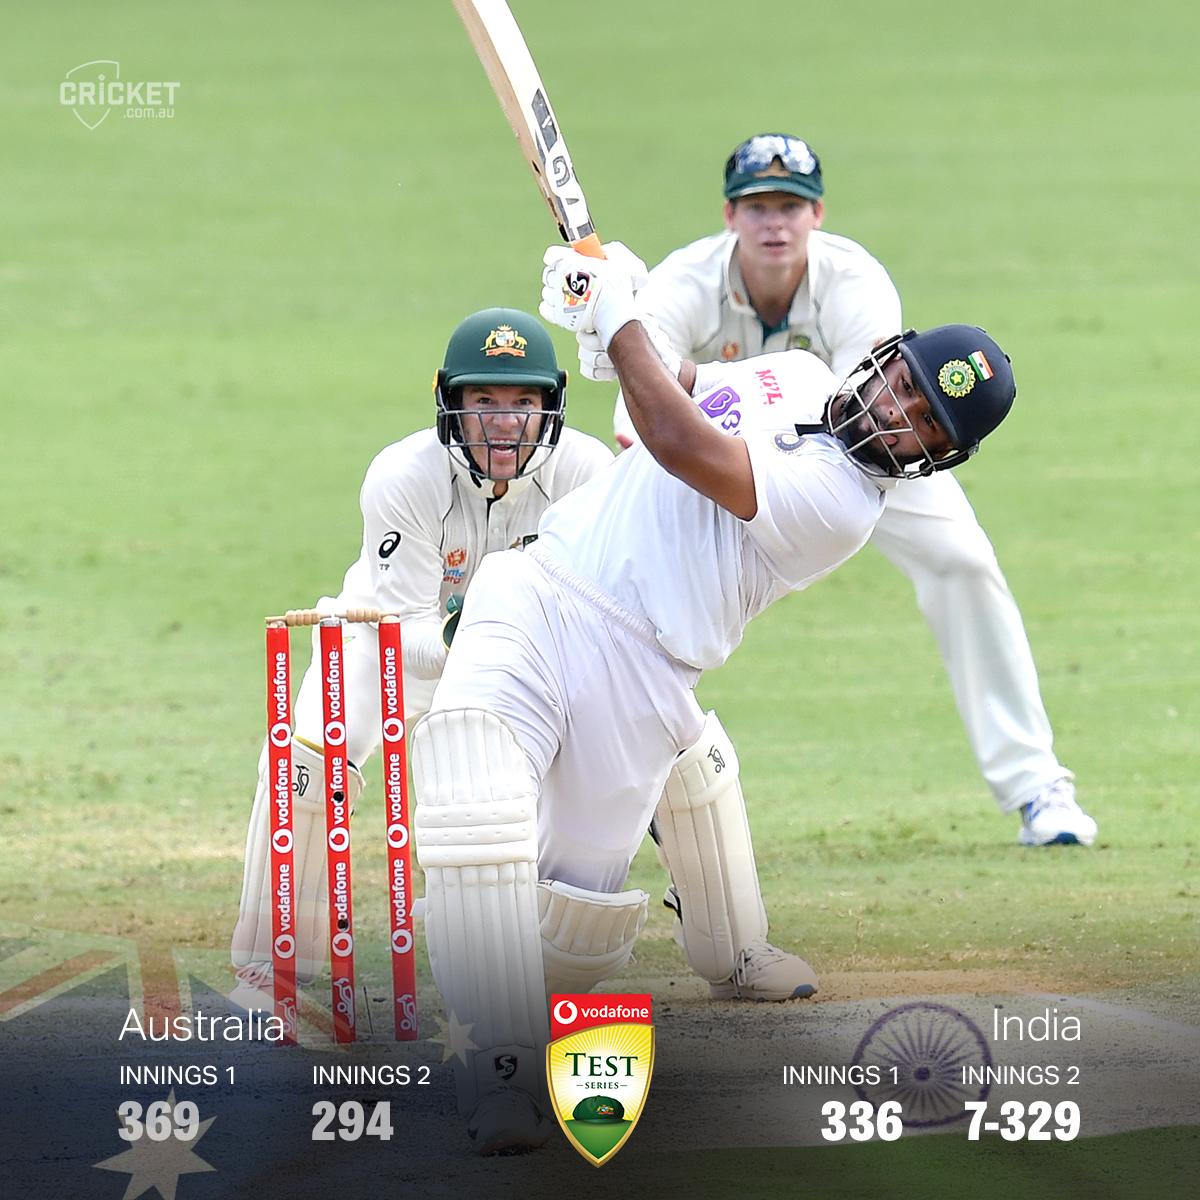 @cricketcomau's photo on #AUSvIND